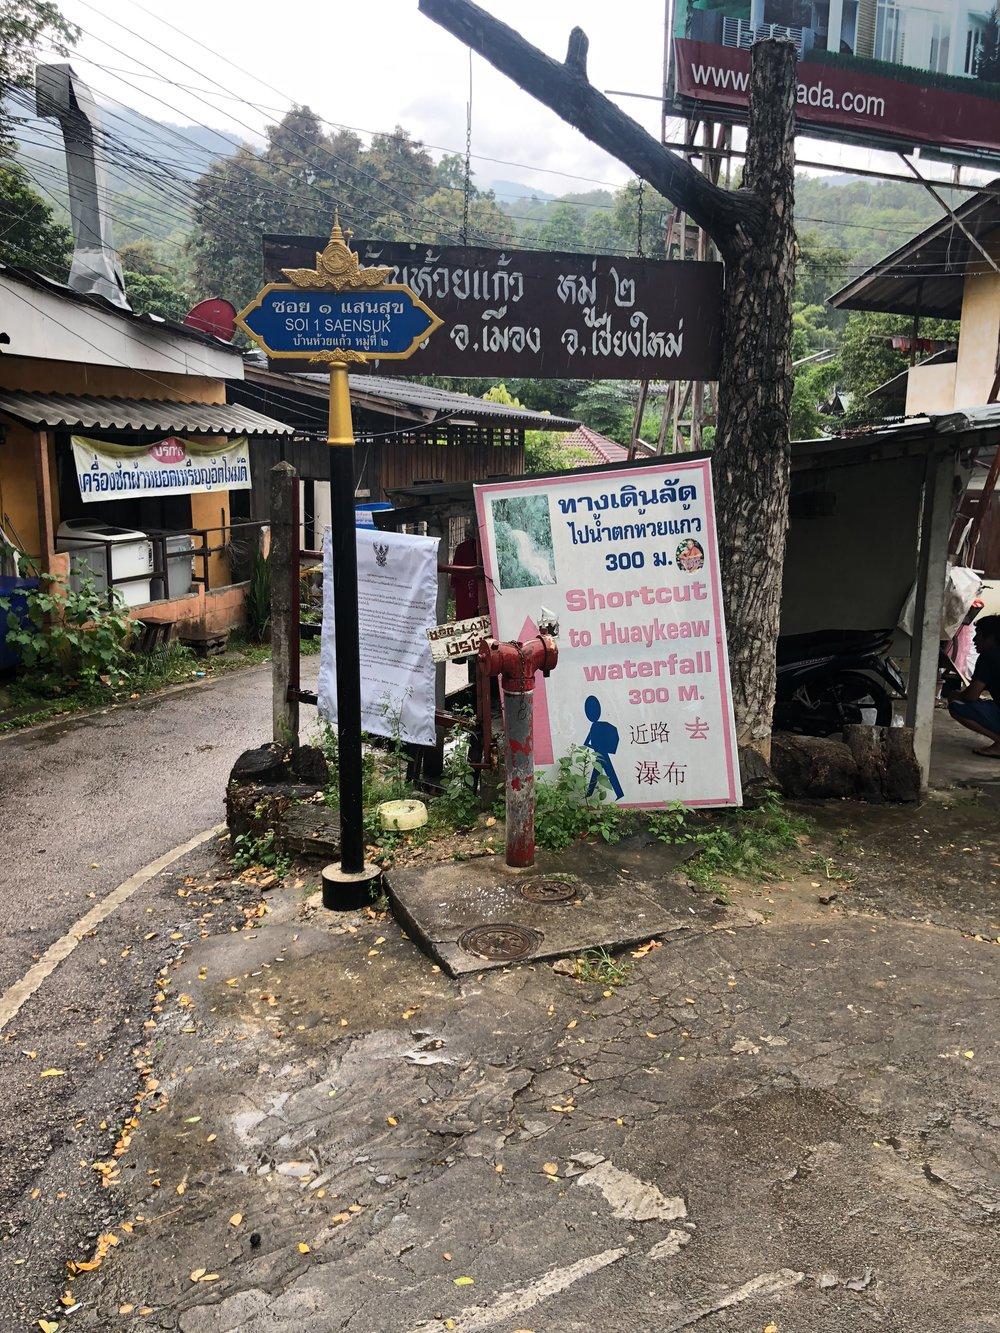 How to get to Huay Kaew Waterfall, Chiang Mai Thailand